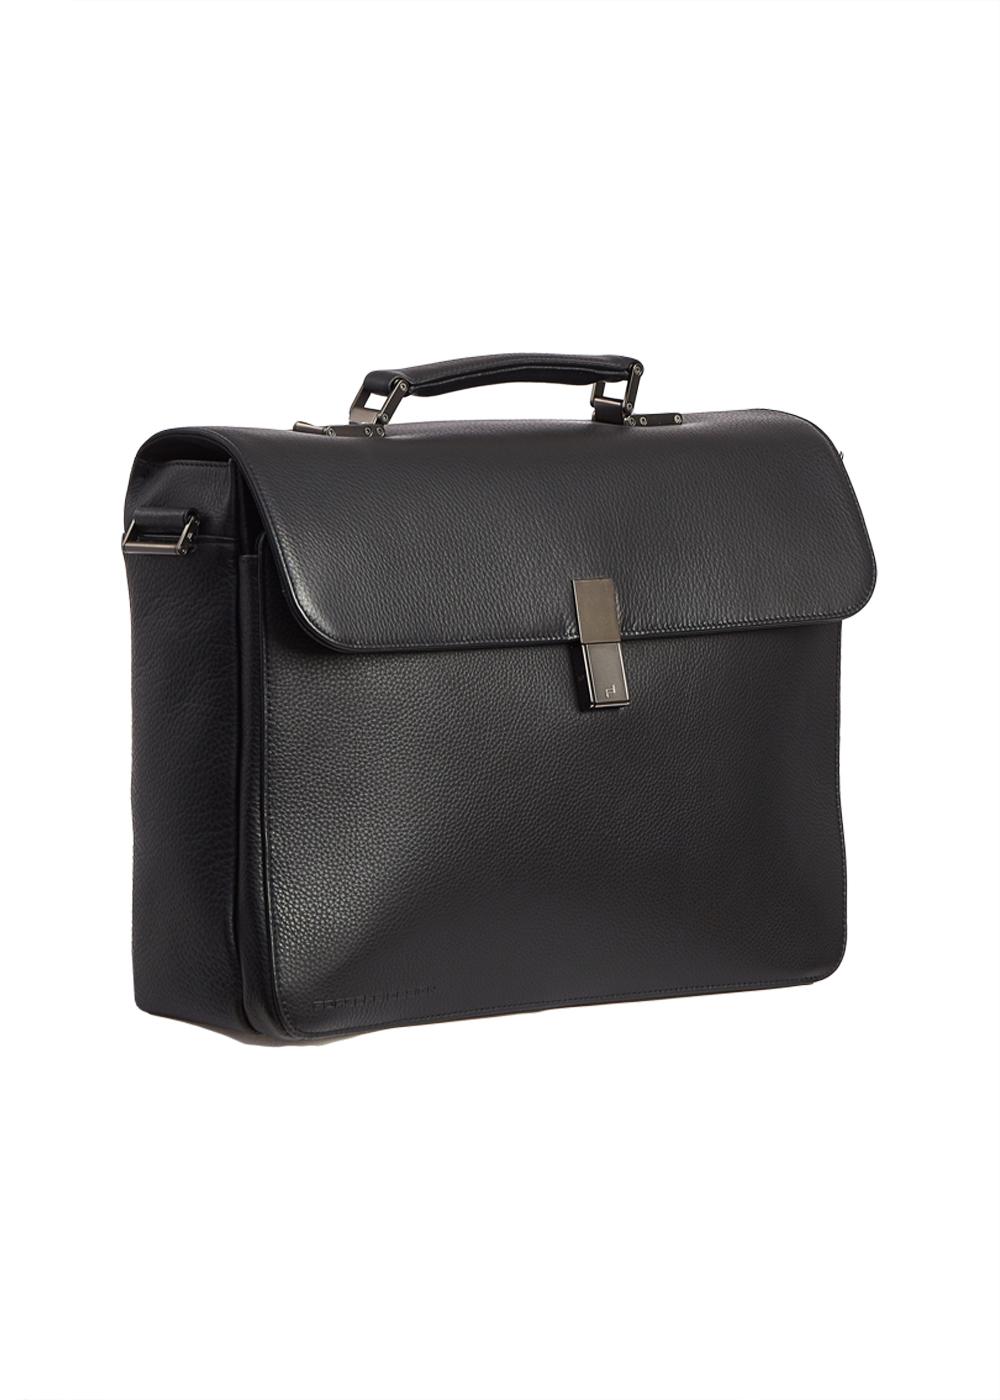 PORSCHE design 4090002306 Портфель